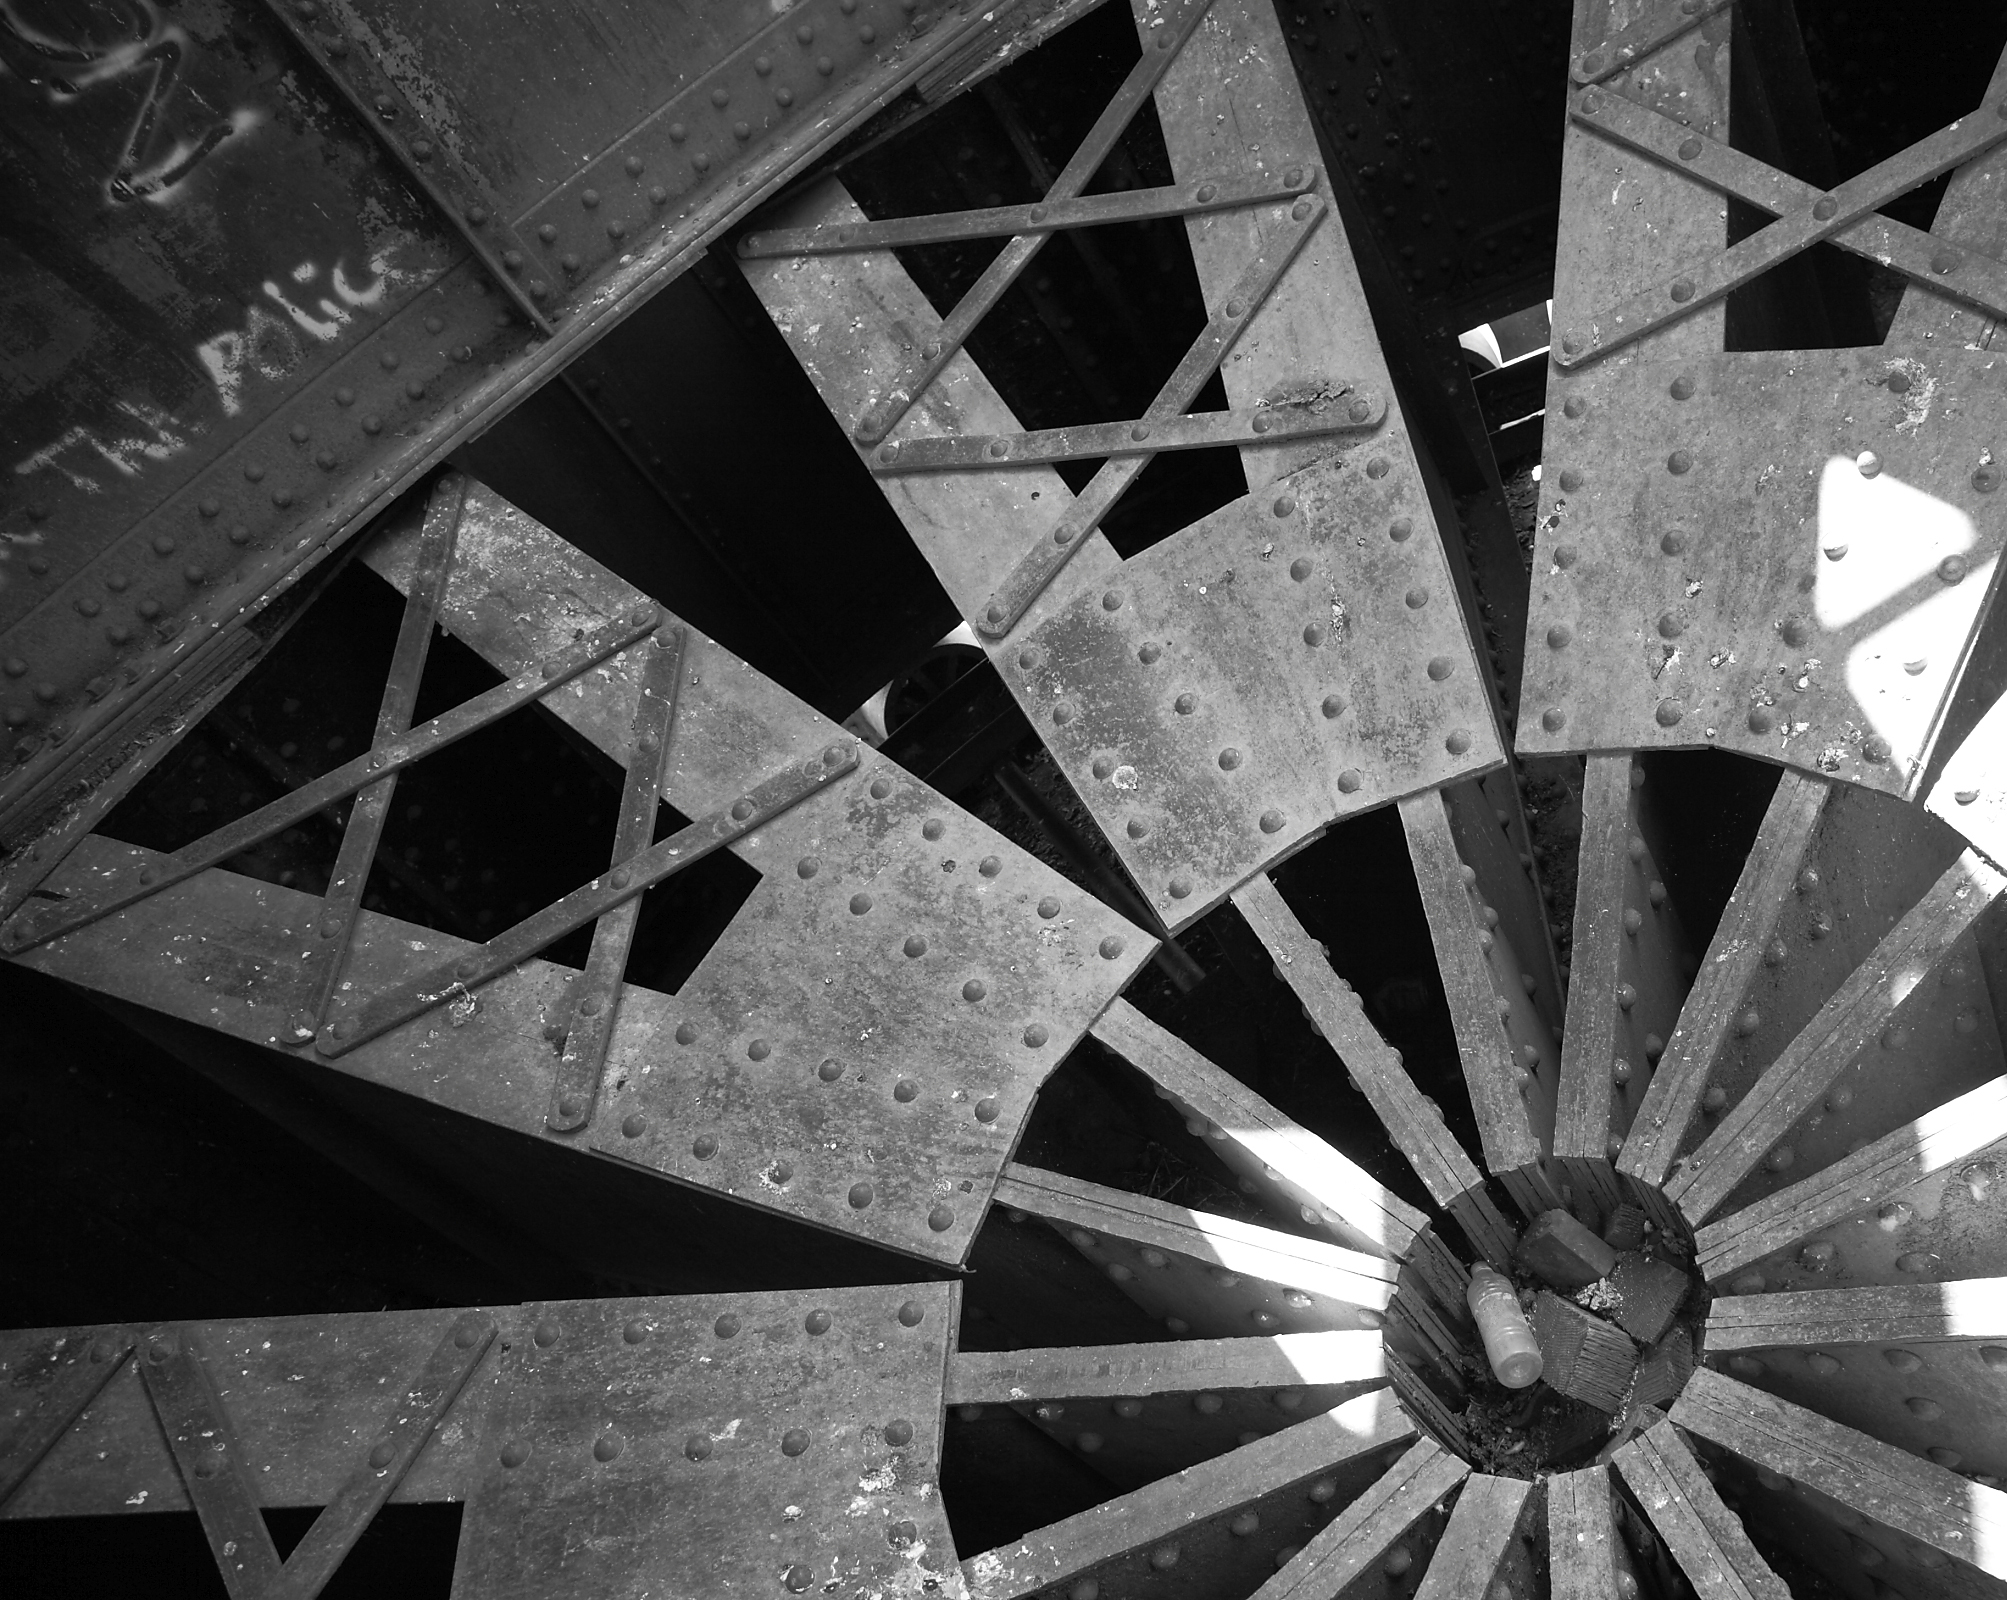 Pierre C&NW Bridge - Interior of Center Swing Bearing (Please credit Daniel R. Pratt and the Historic American Engineering Record)